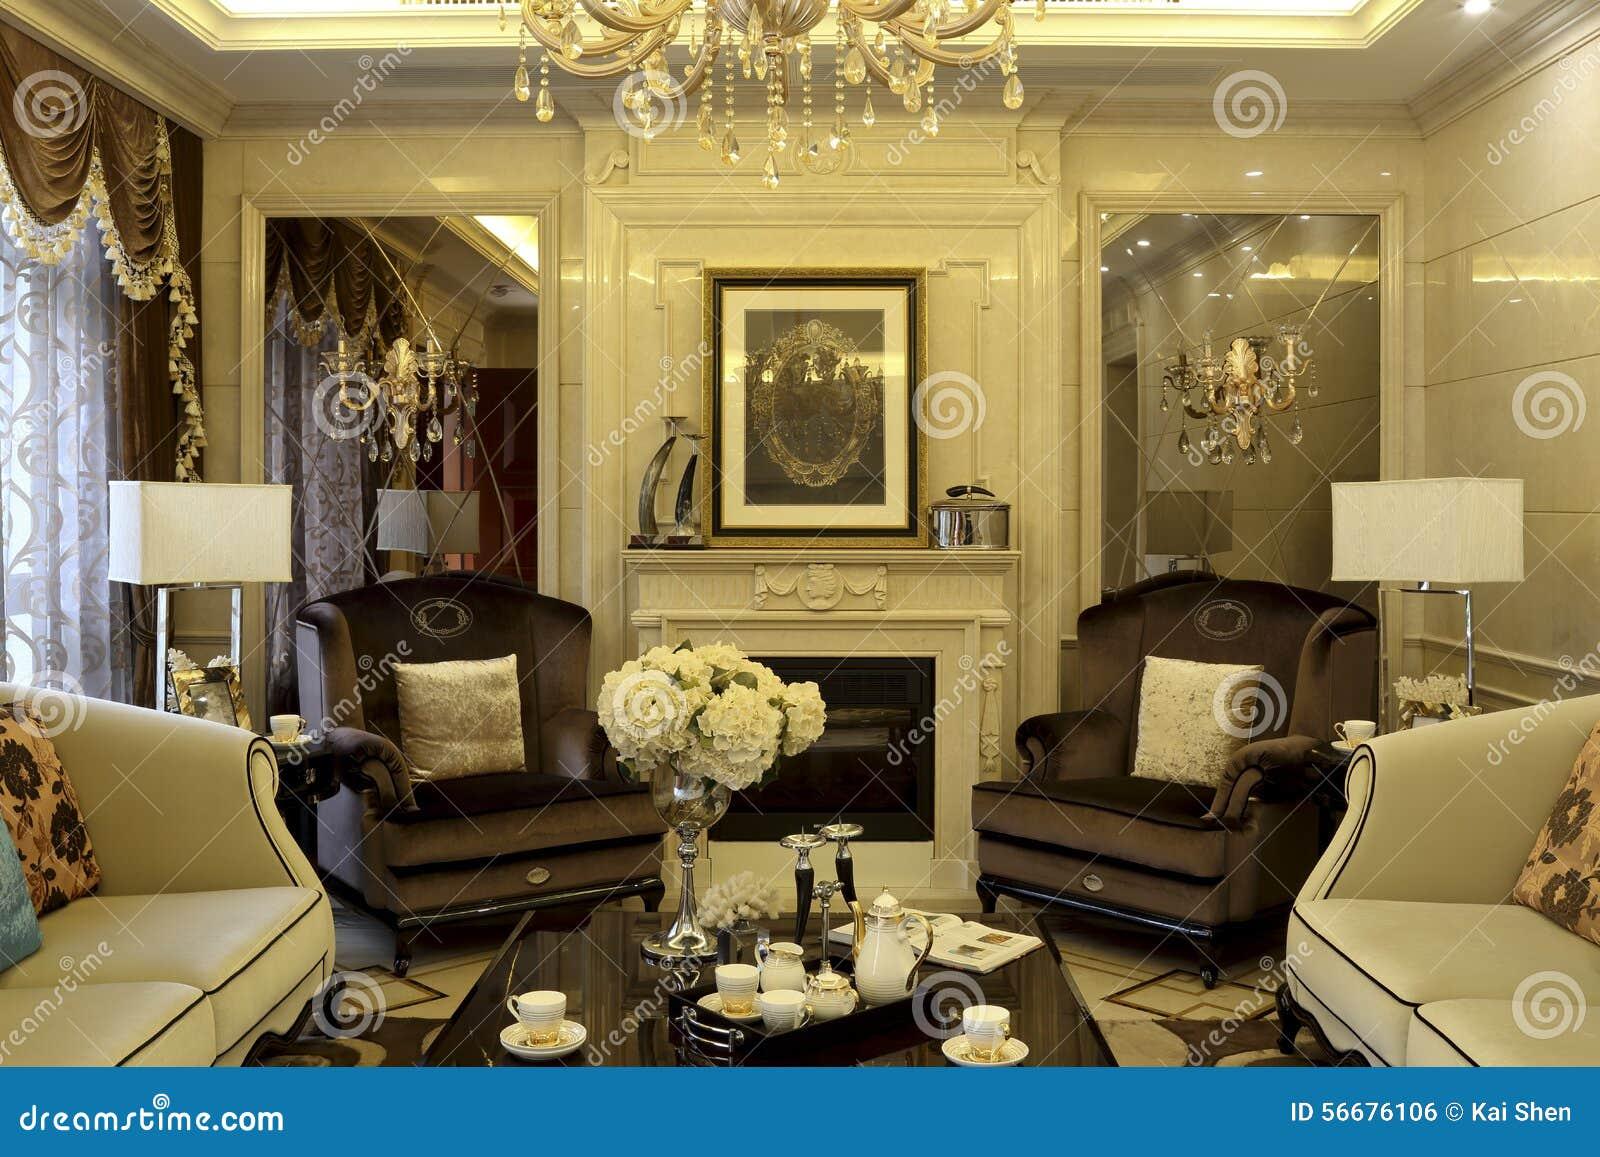 European Style Luxury Living Room Stock Photo Image 56676106